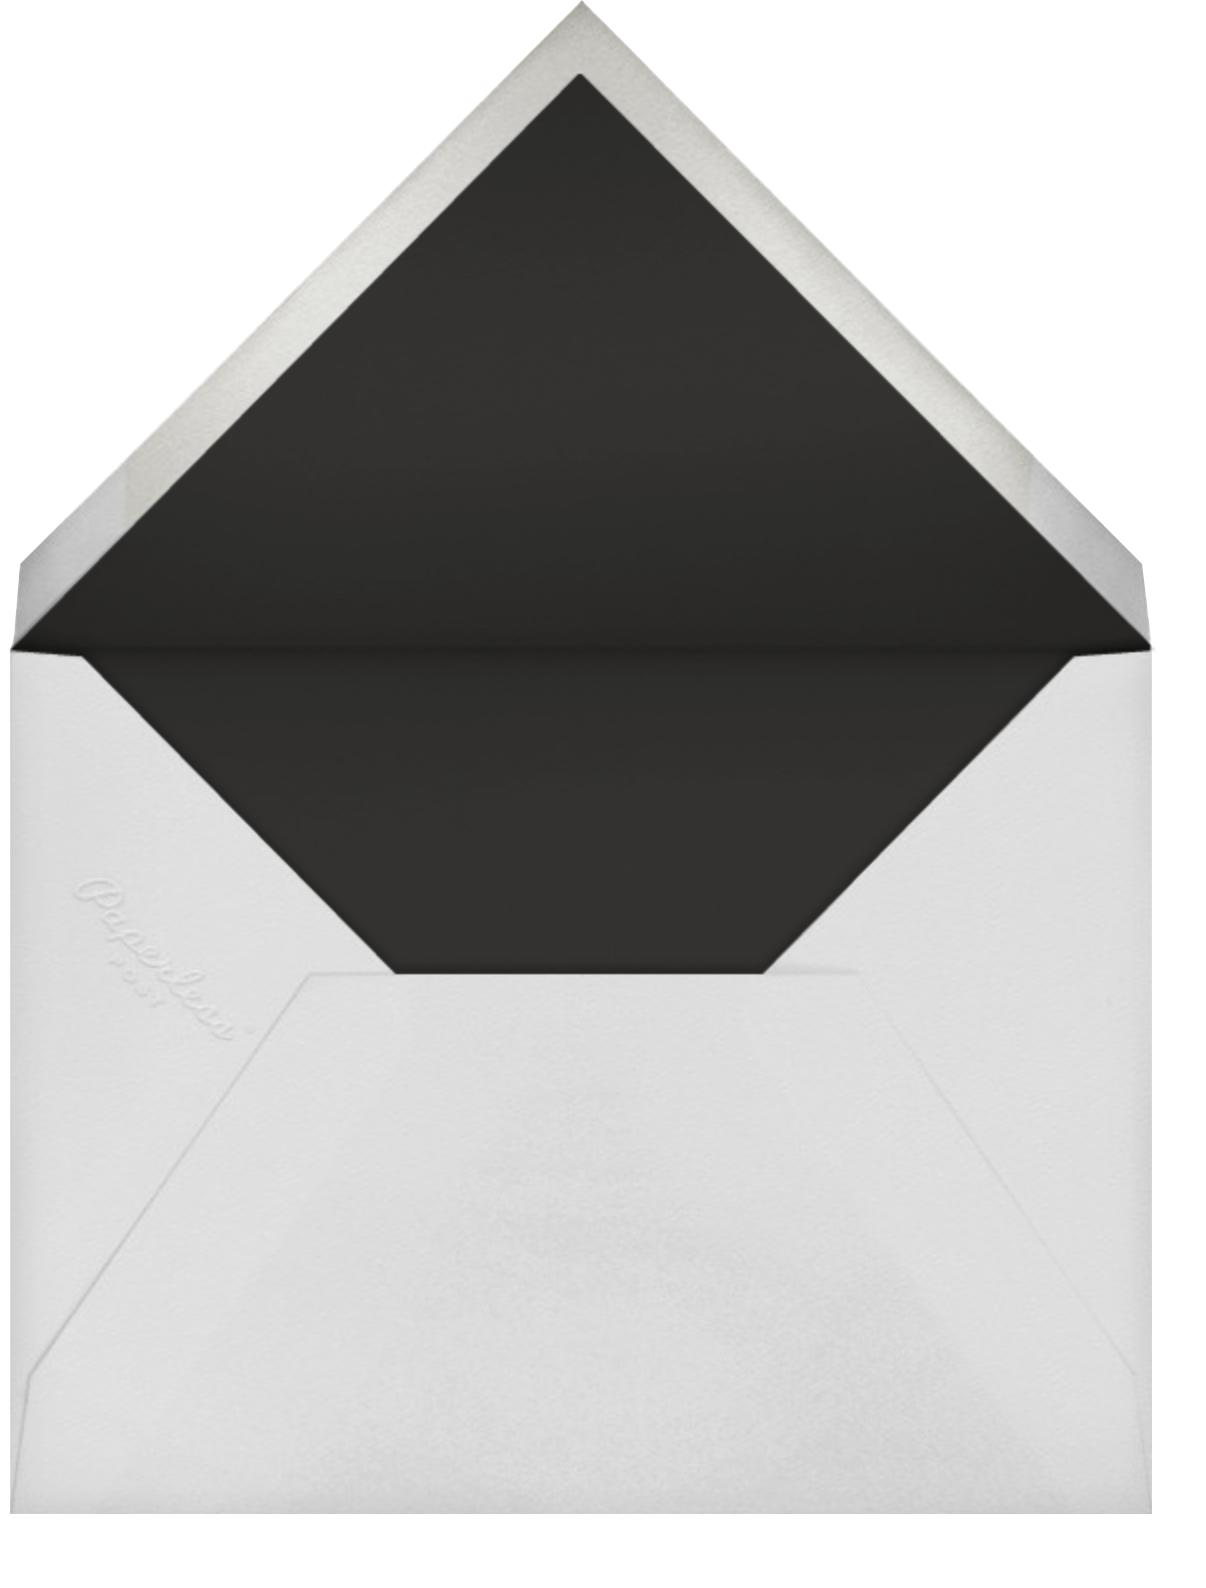 White Tartan (Stationery) - Blind - Vera Wang - Personalized stationery - envelope back